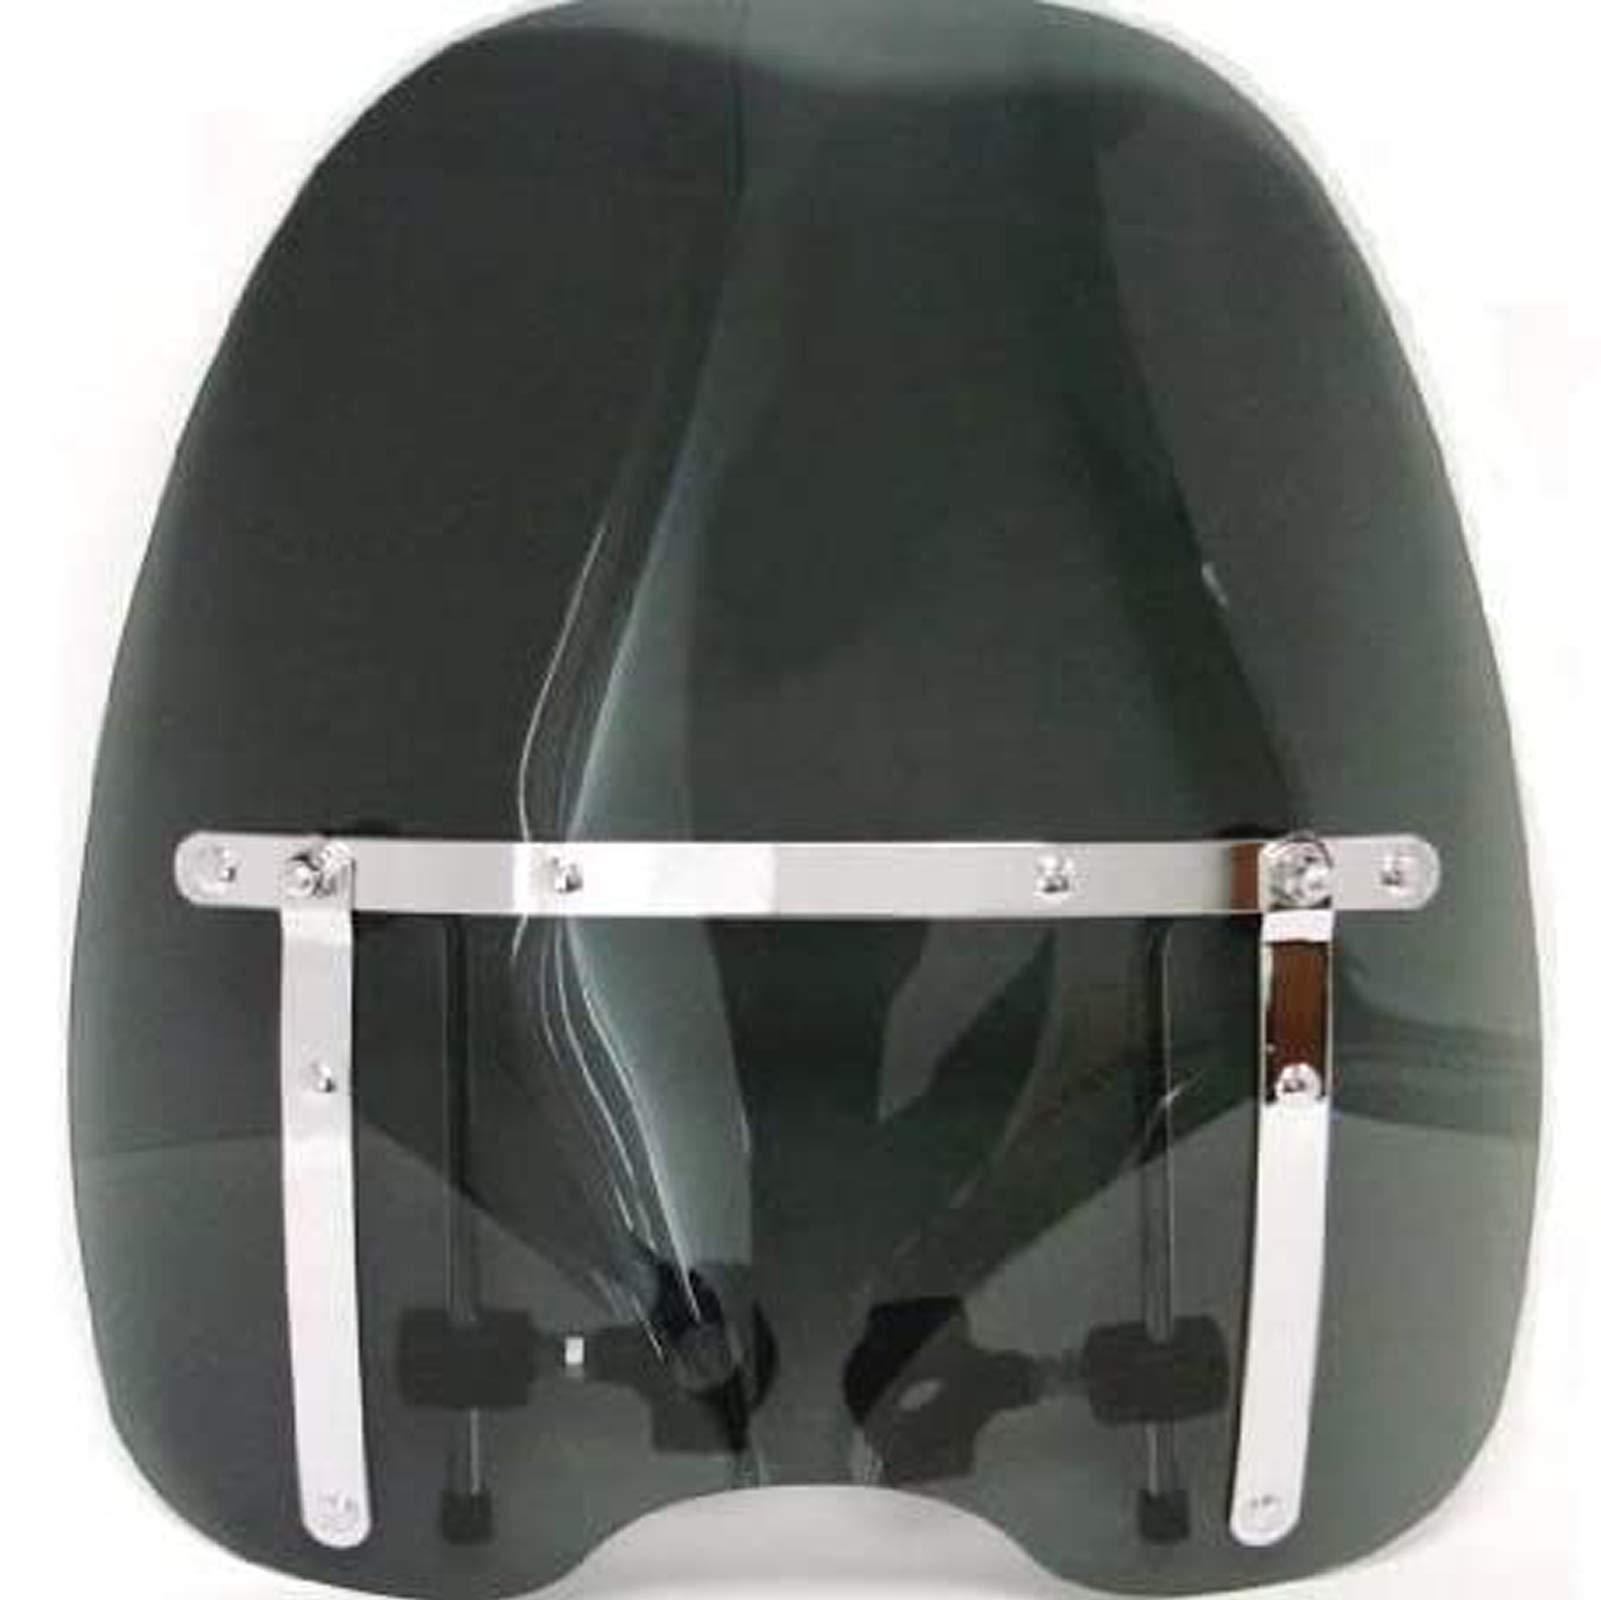 Smoke 1816 Tinted Windshield Windscreen Compatible With Kawasaki Yamaha Honda Suzuki Harley Motorcycle